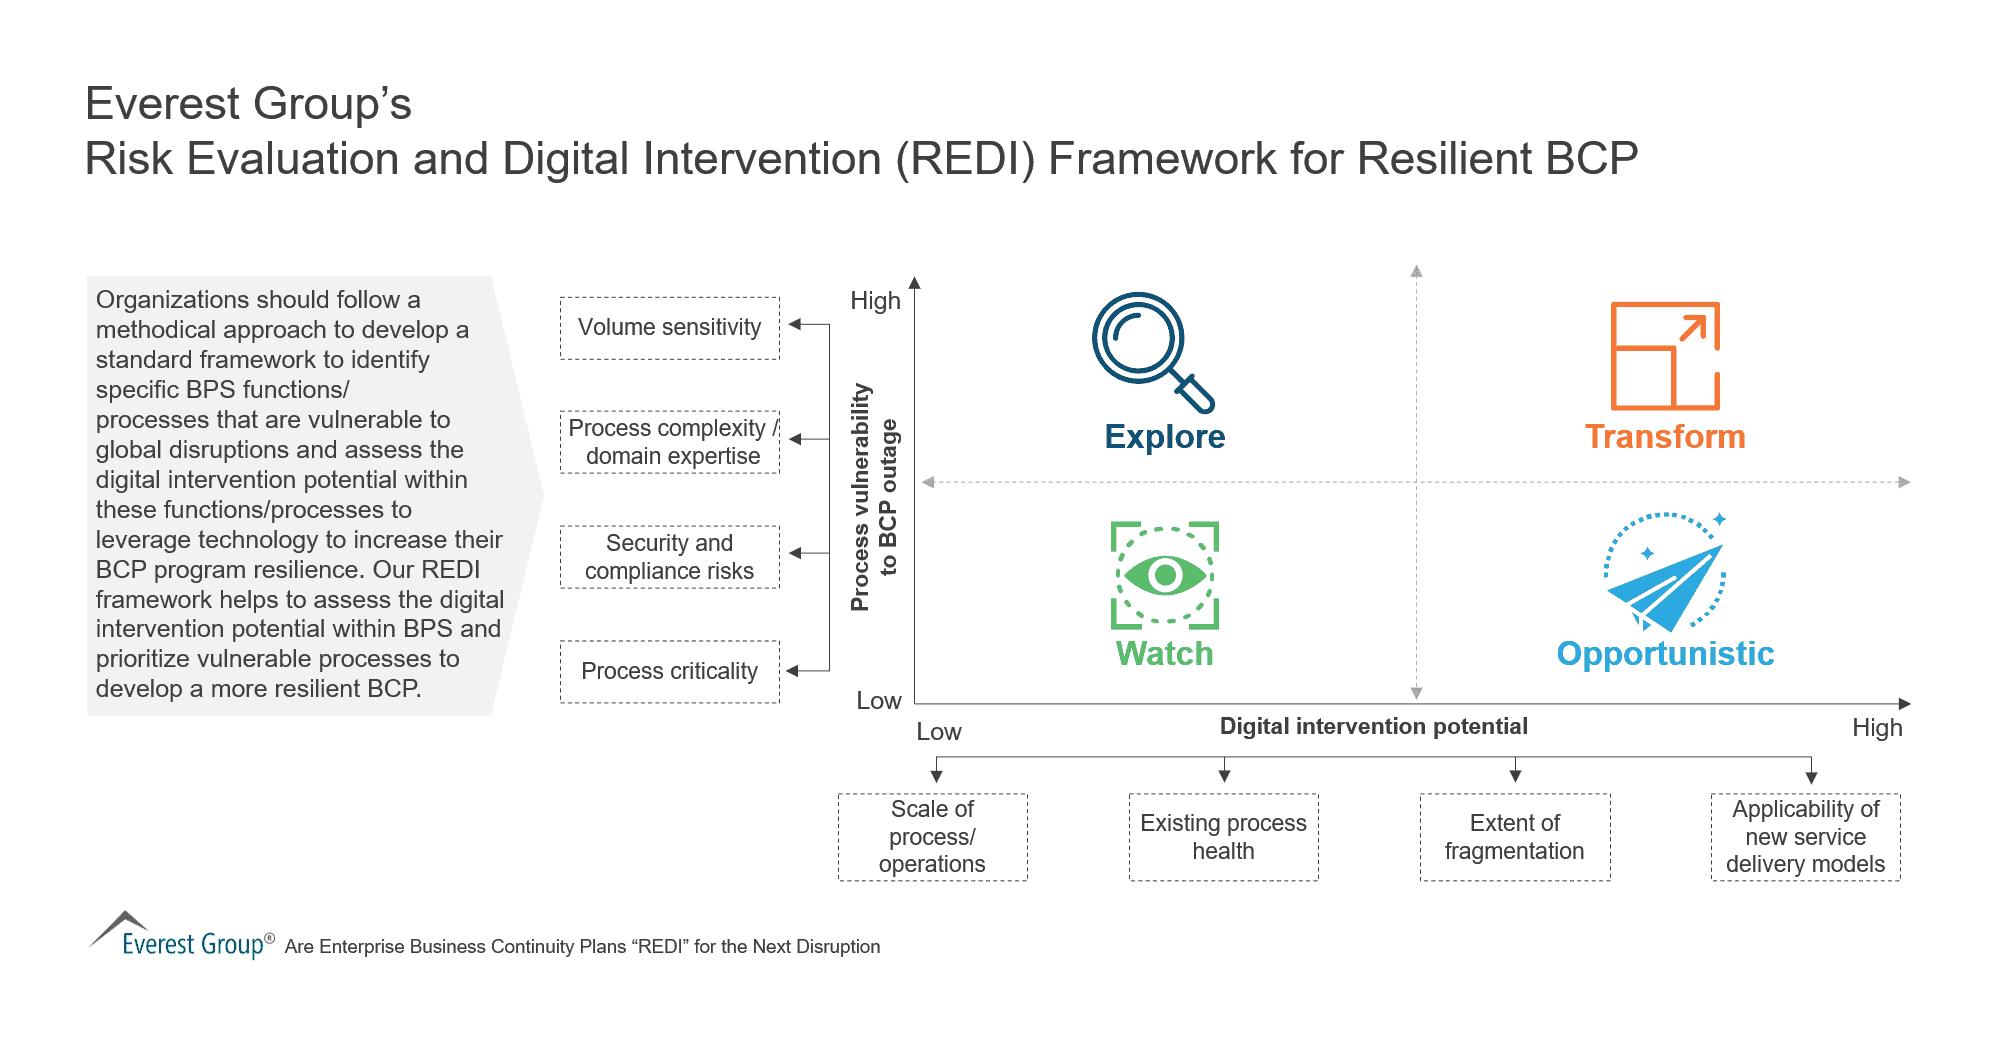 Risk Evaluation and Digital Intervention (REDI) Framework for Resilient BCP